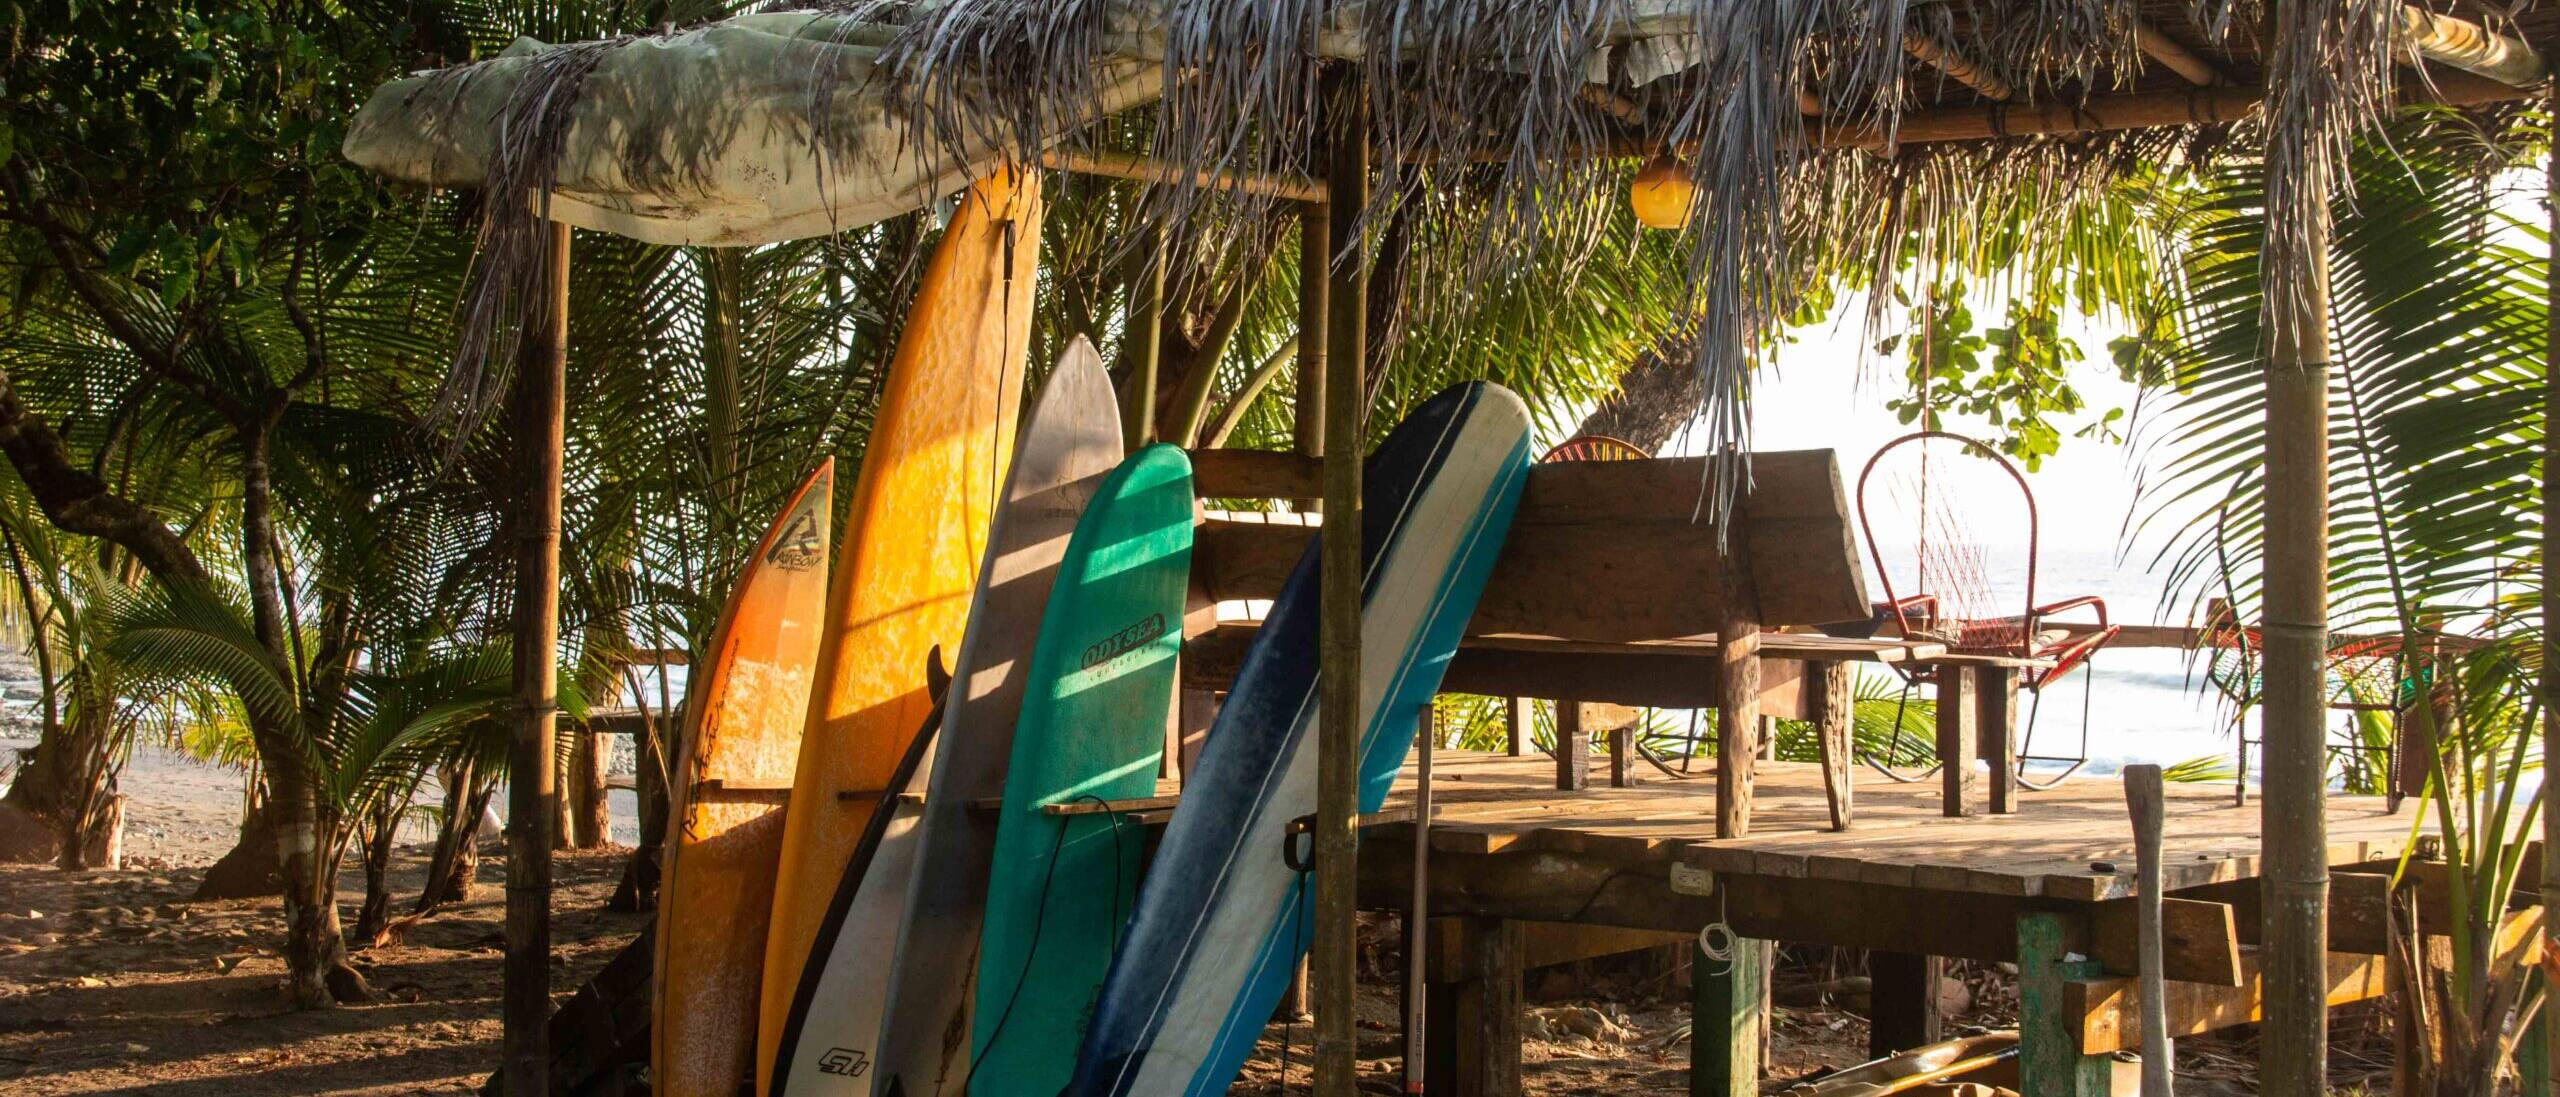 surfboards Rancho Burica Costa Rica